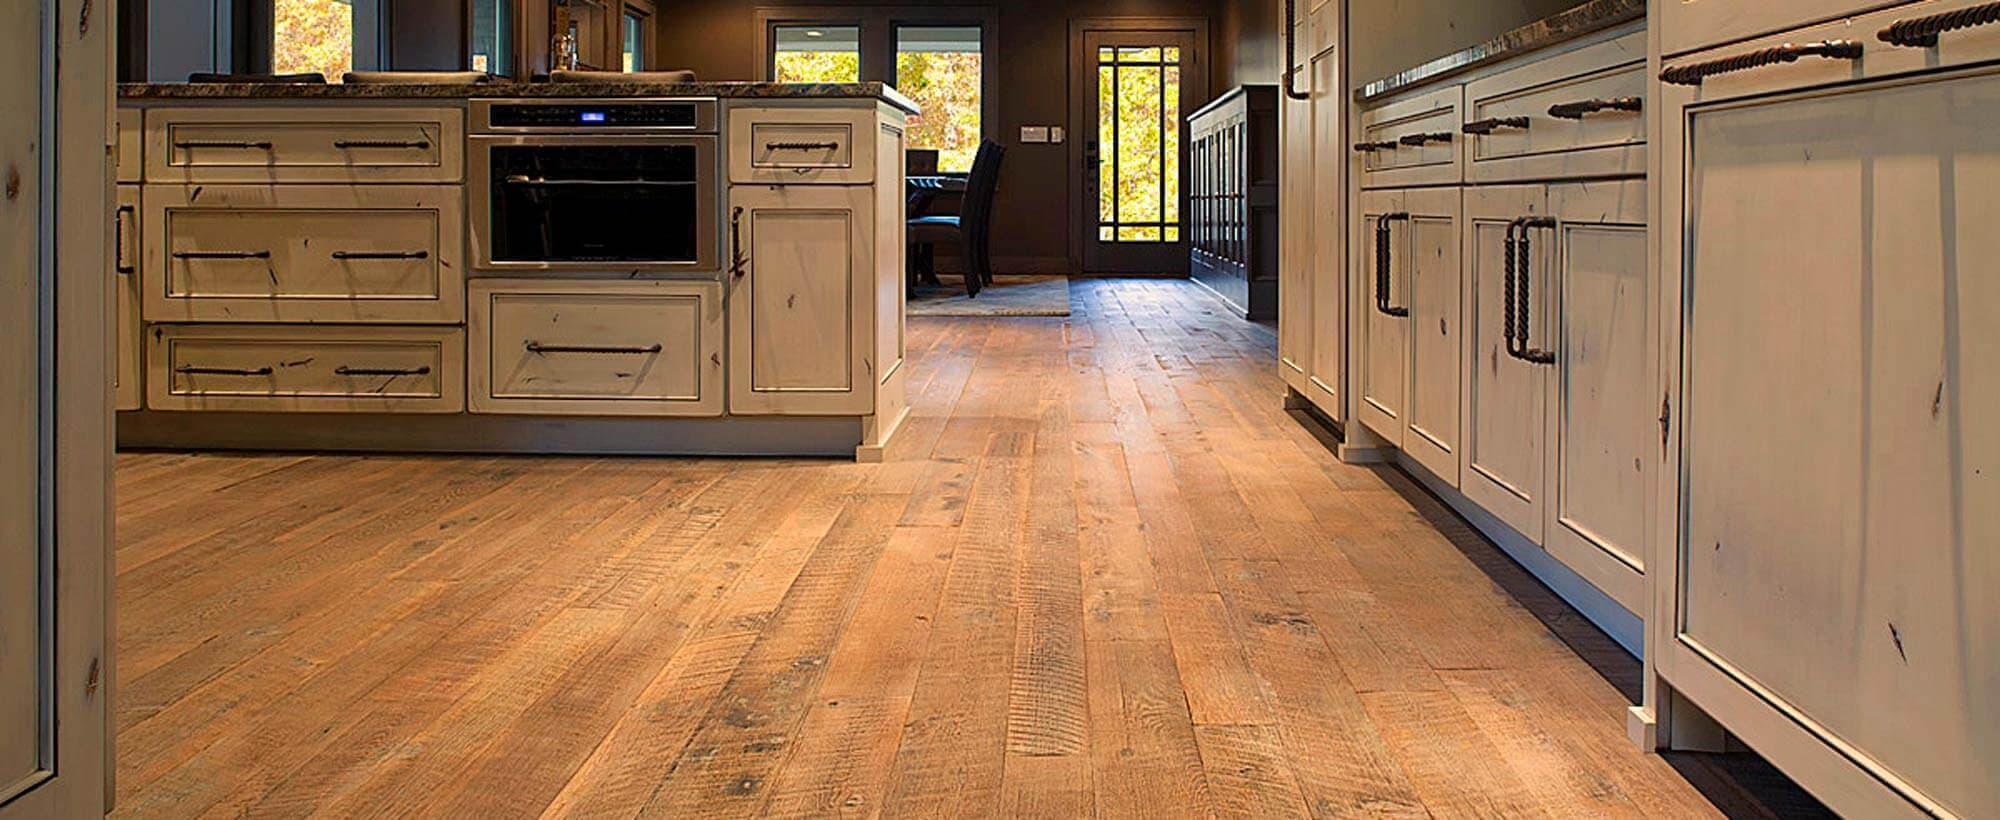 Reclaimed oak flooring in Candler North Carolina kitchen.